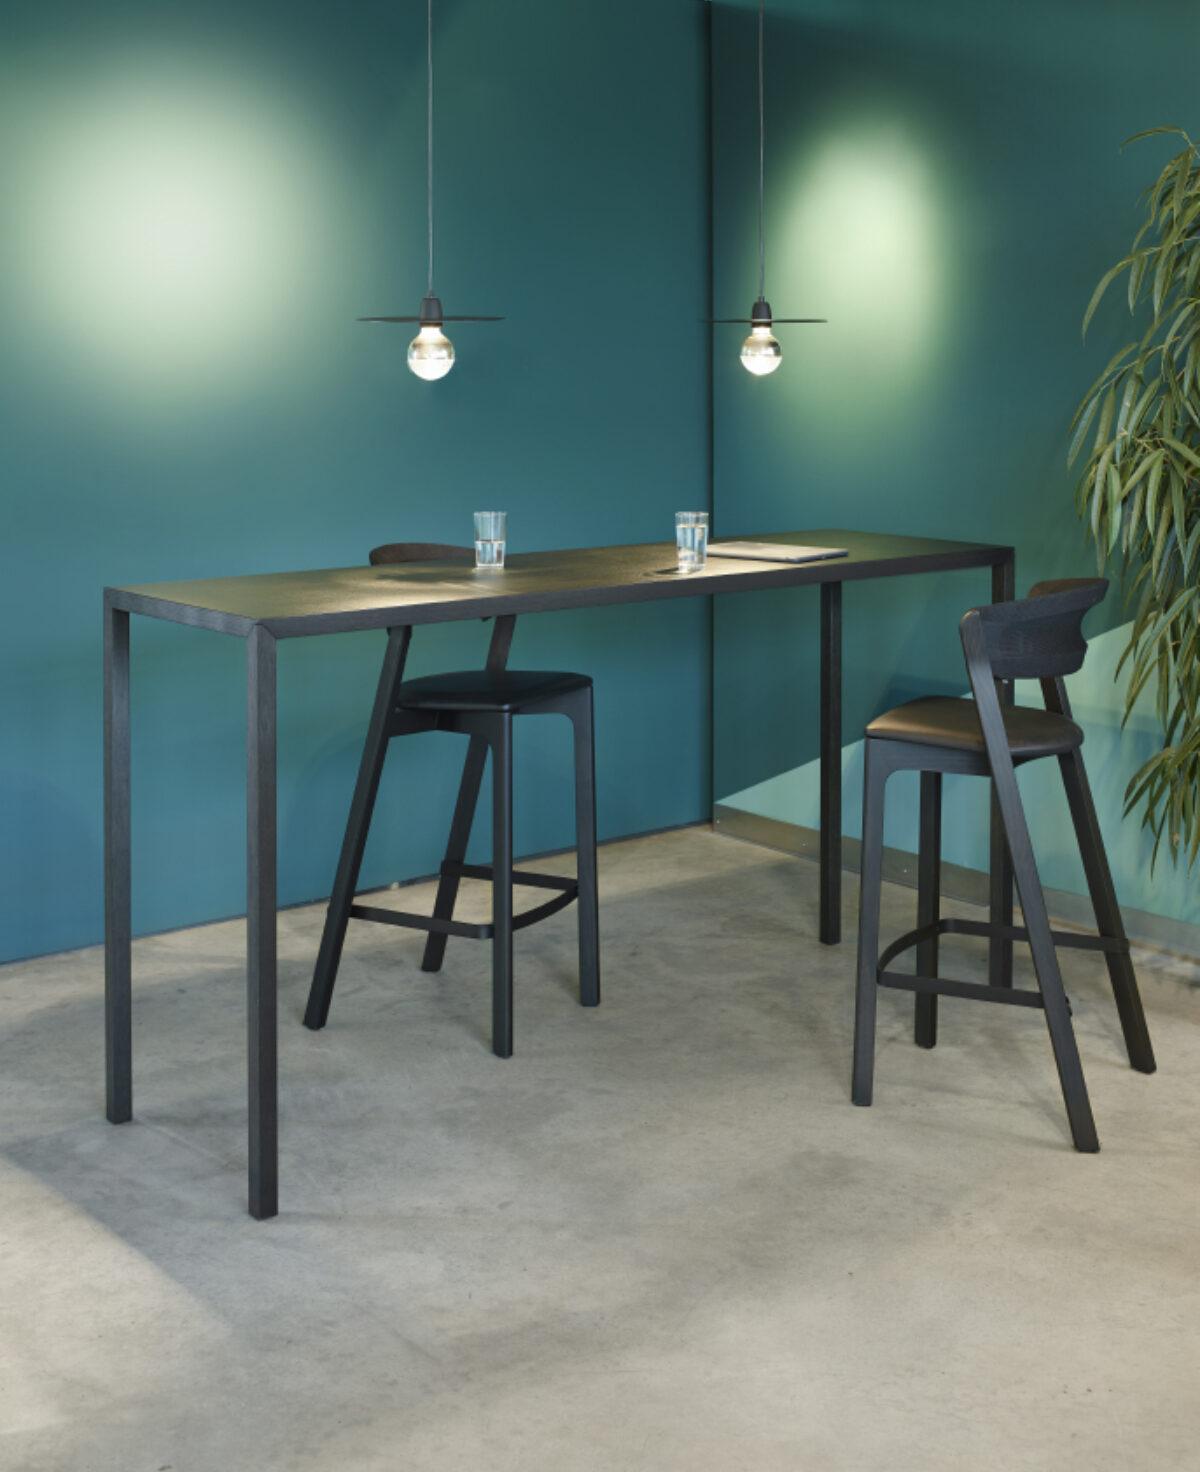 Arco Slim Standing Bertjan Pot Low Res Ambient 01